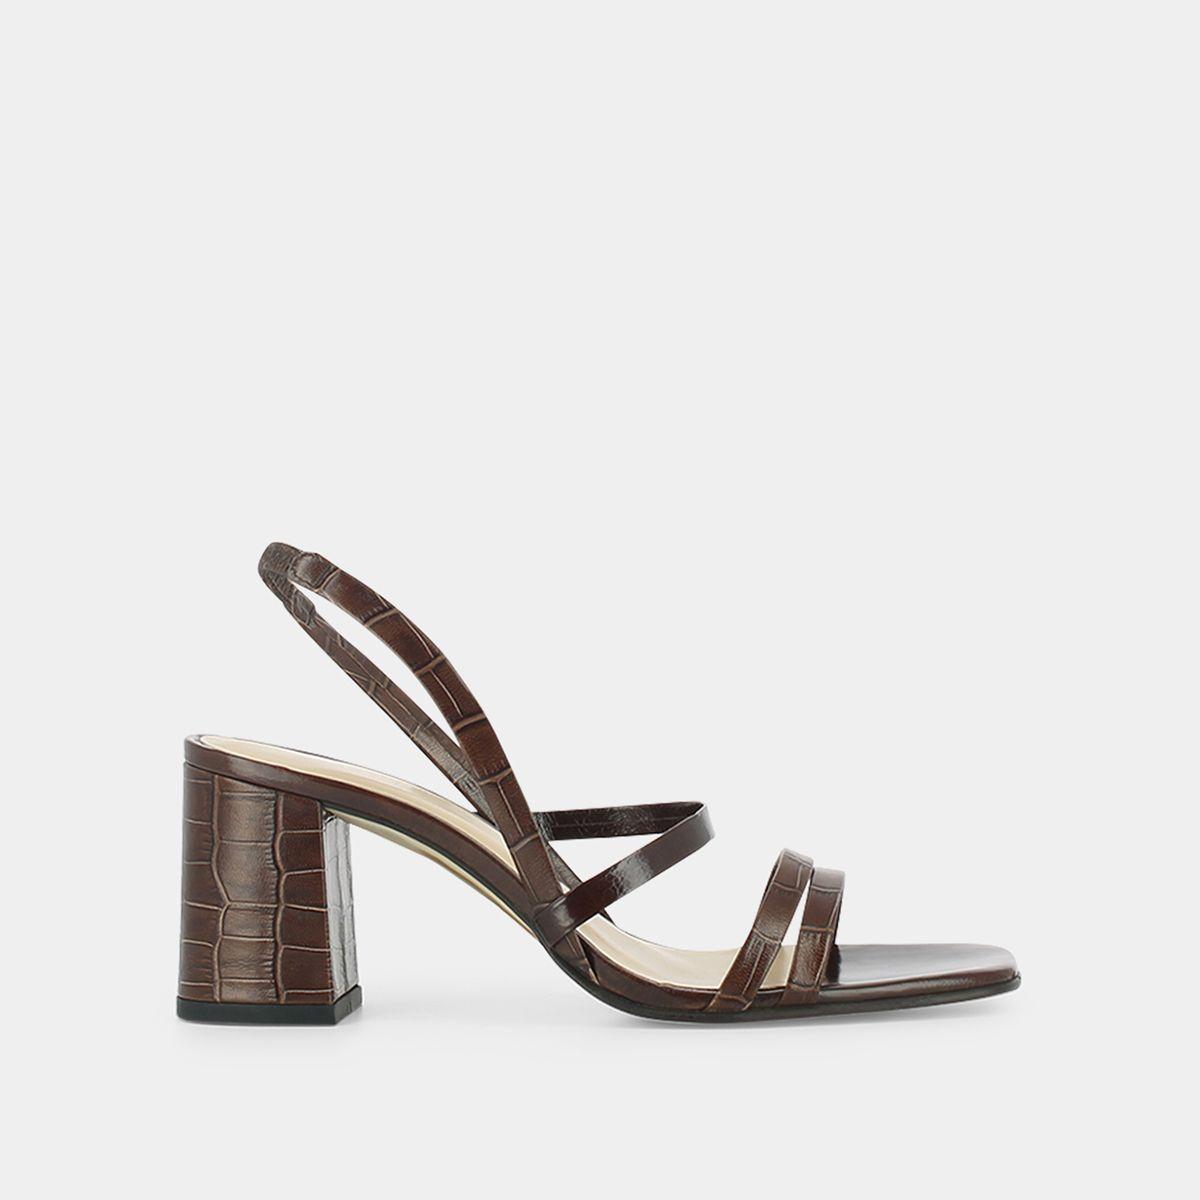 Sandales à talon Jonak en cuir vieilli croco marron